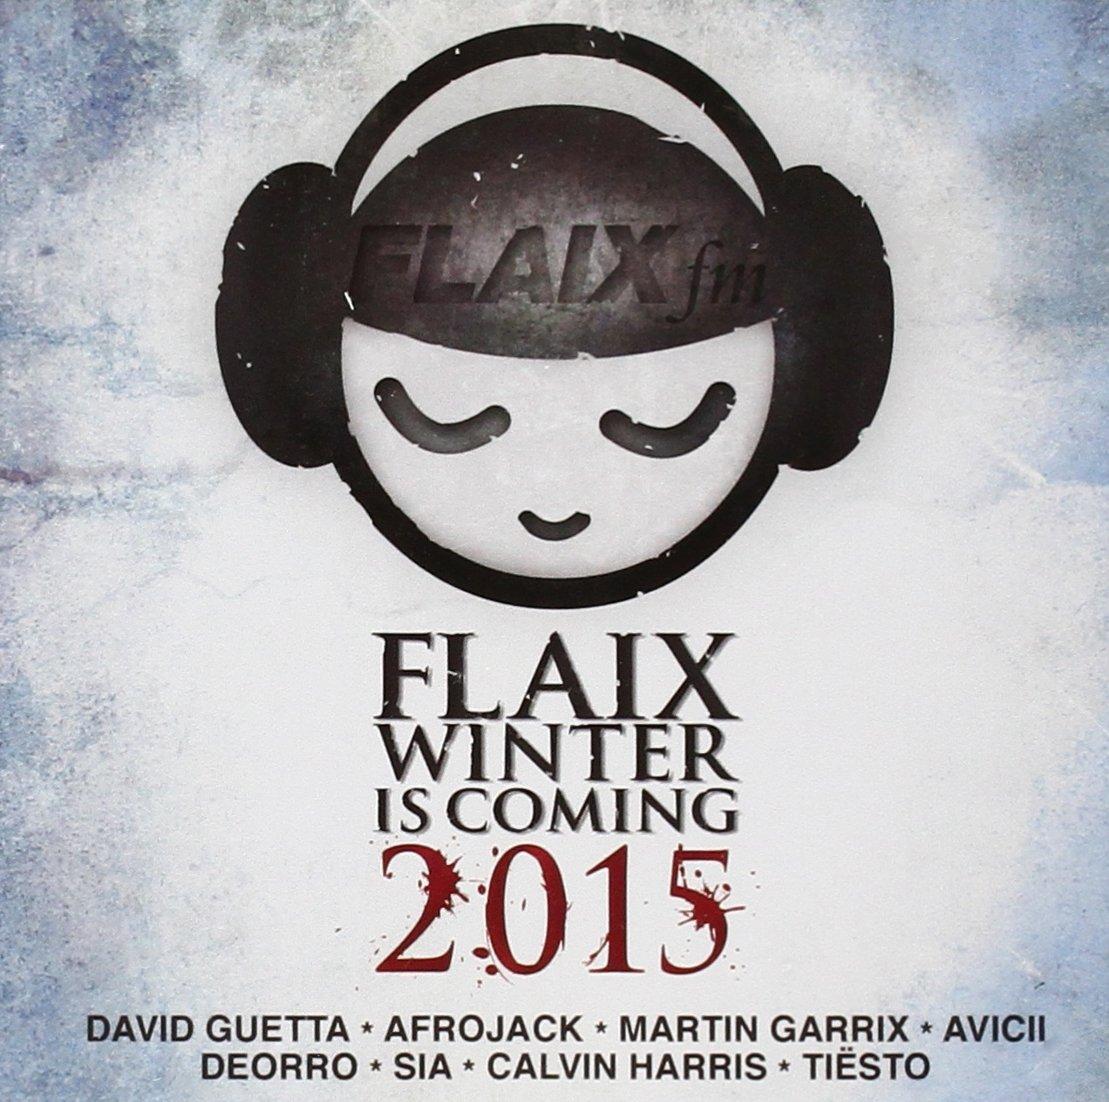 fm musica dance: